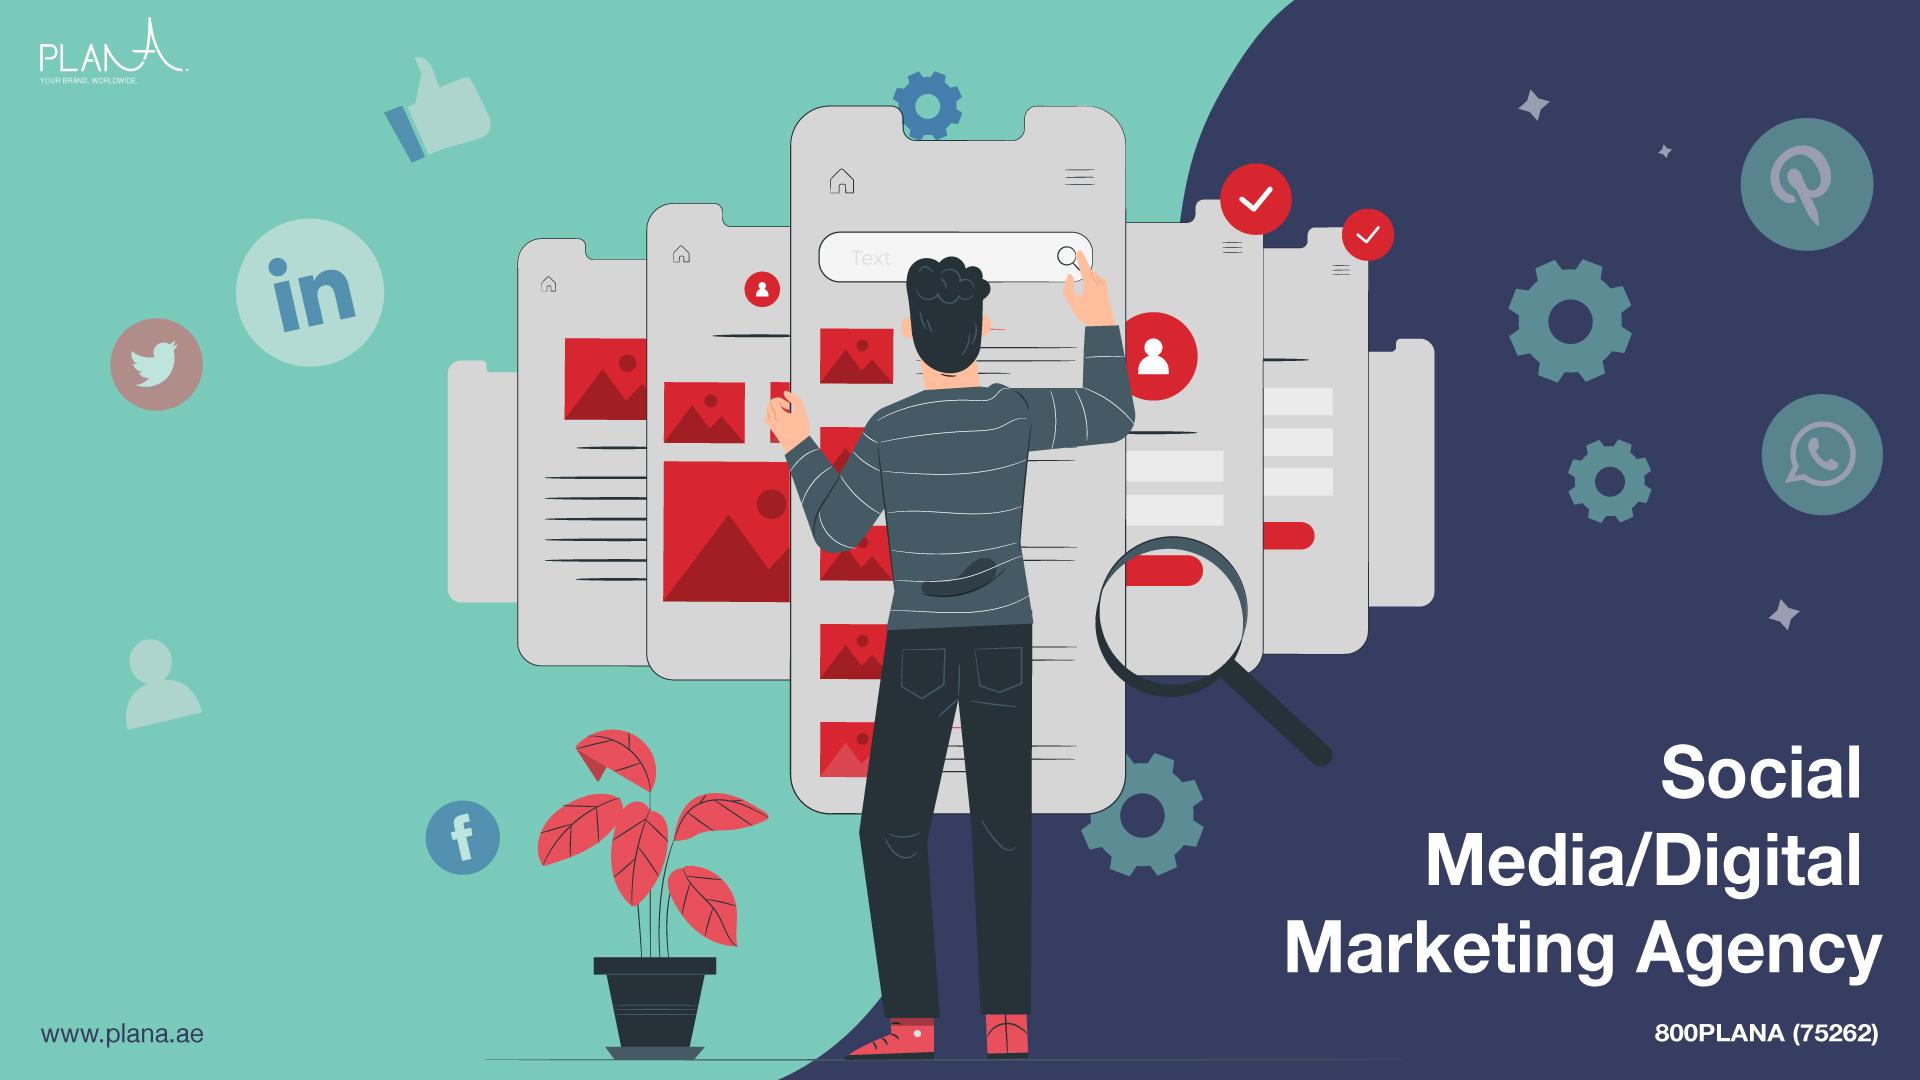 What Is Good Social Media/Digital Marketing Agency That Will Help Grow Online Community?